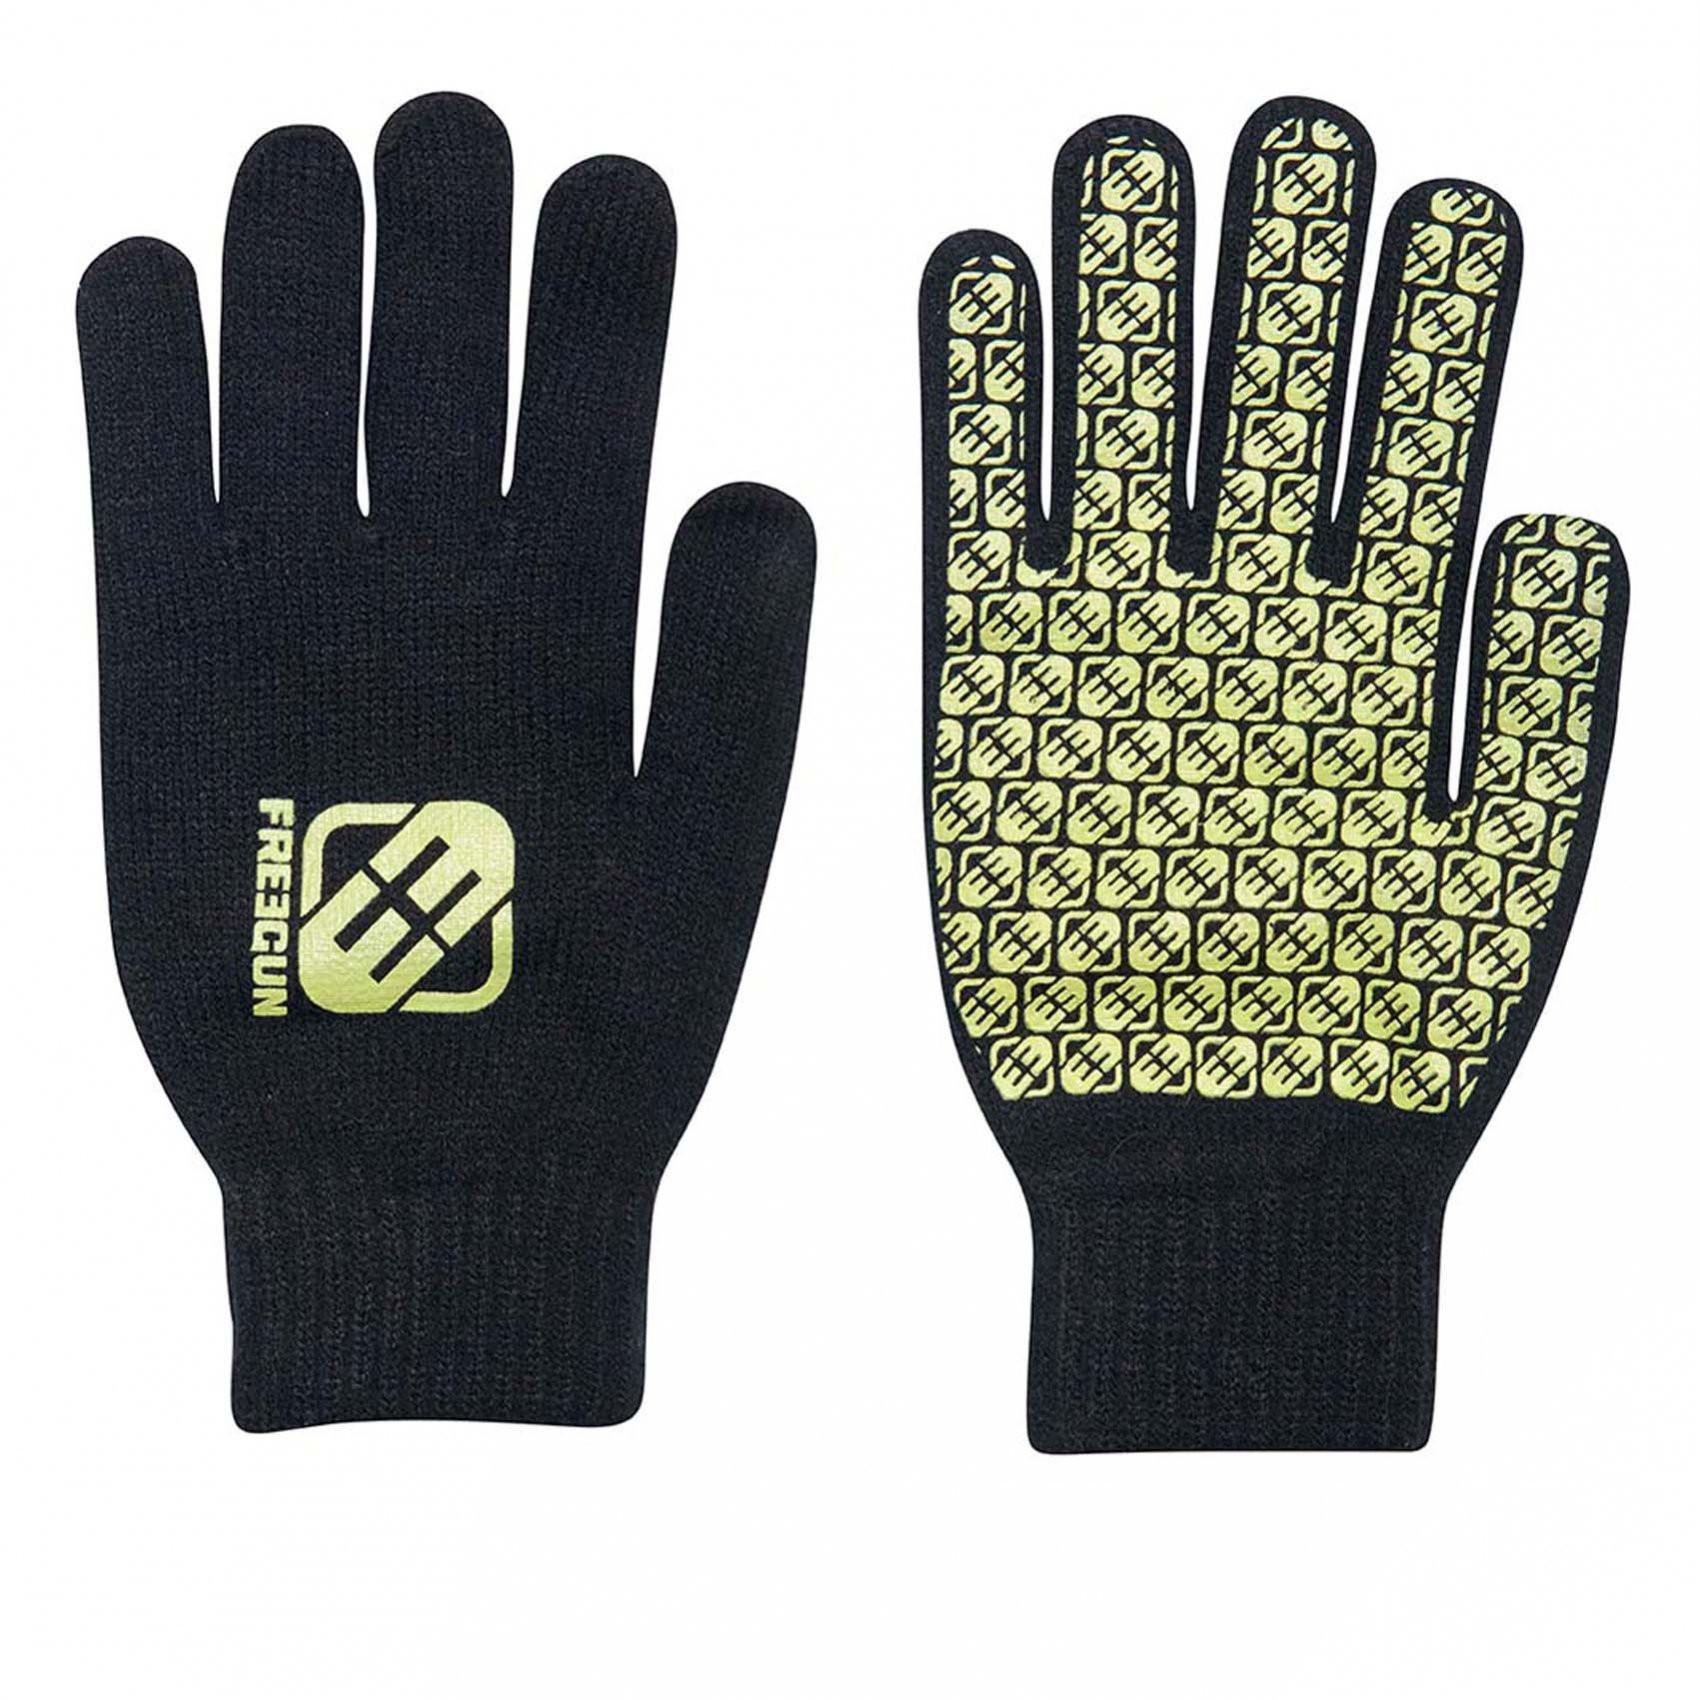 Paire de gants homme logo vert freegun (photo)